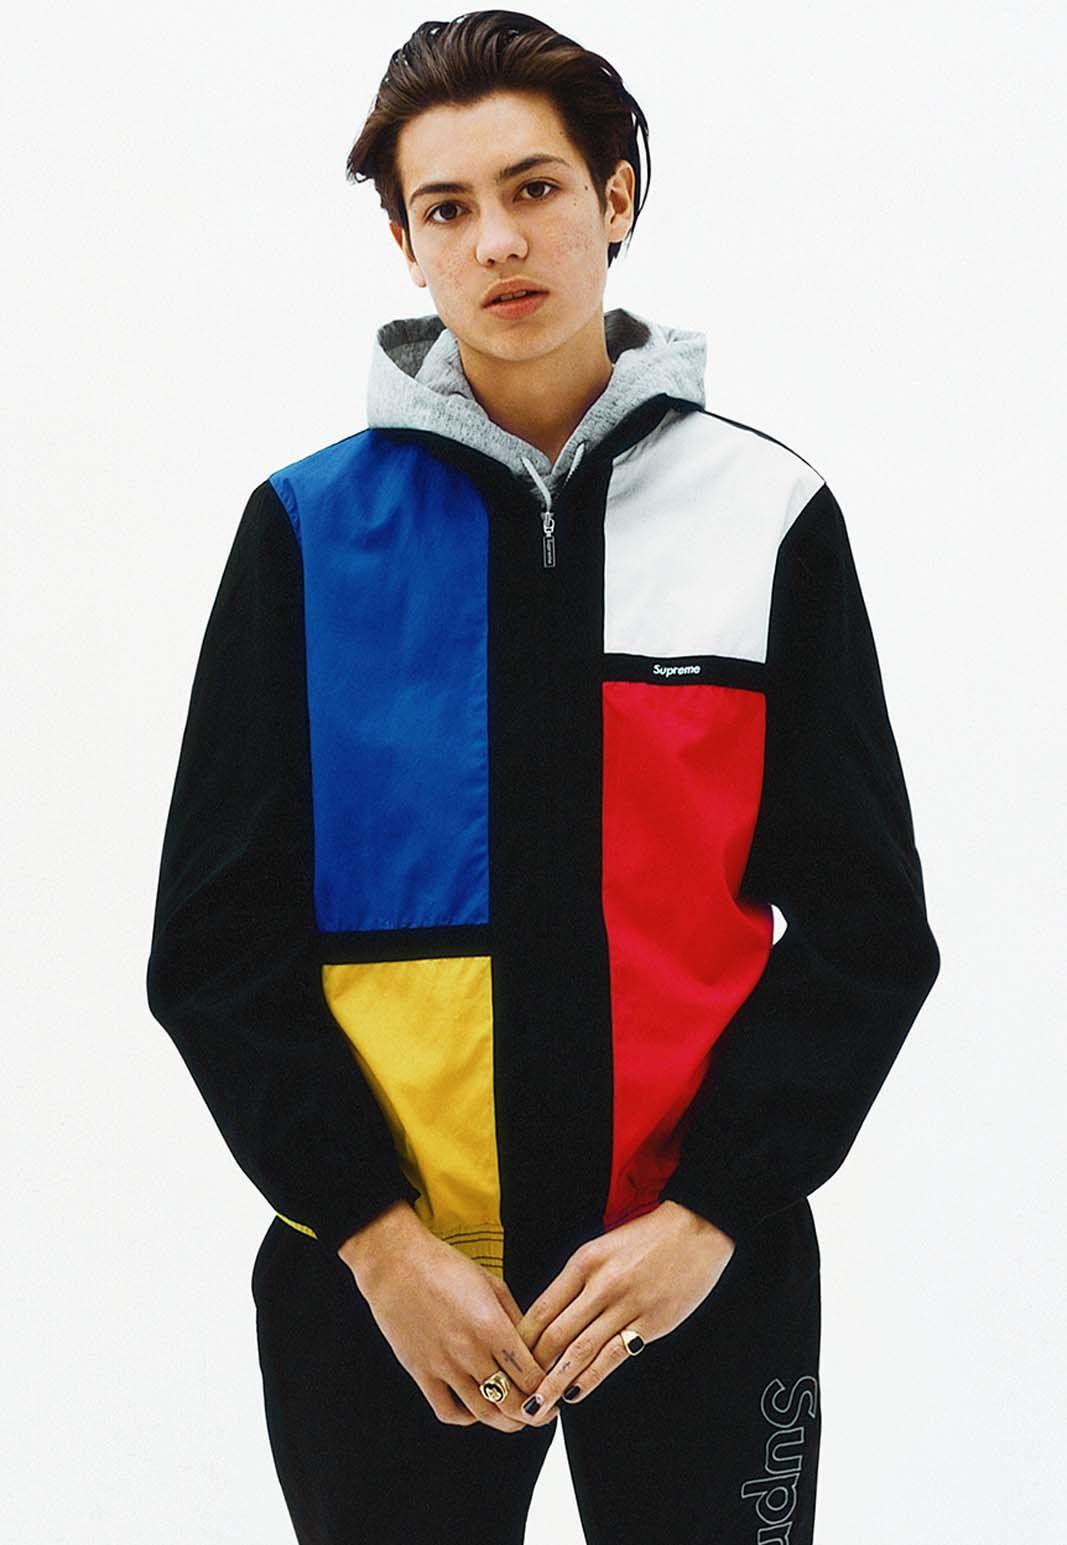 d8aa6e036752 Mondrian - YSL - Supreme | fashion in 2019 | Summer lookbook ...